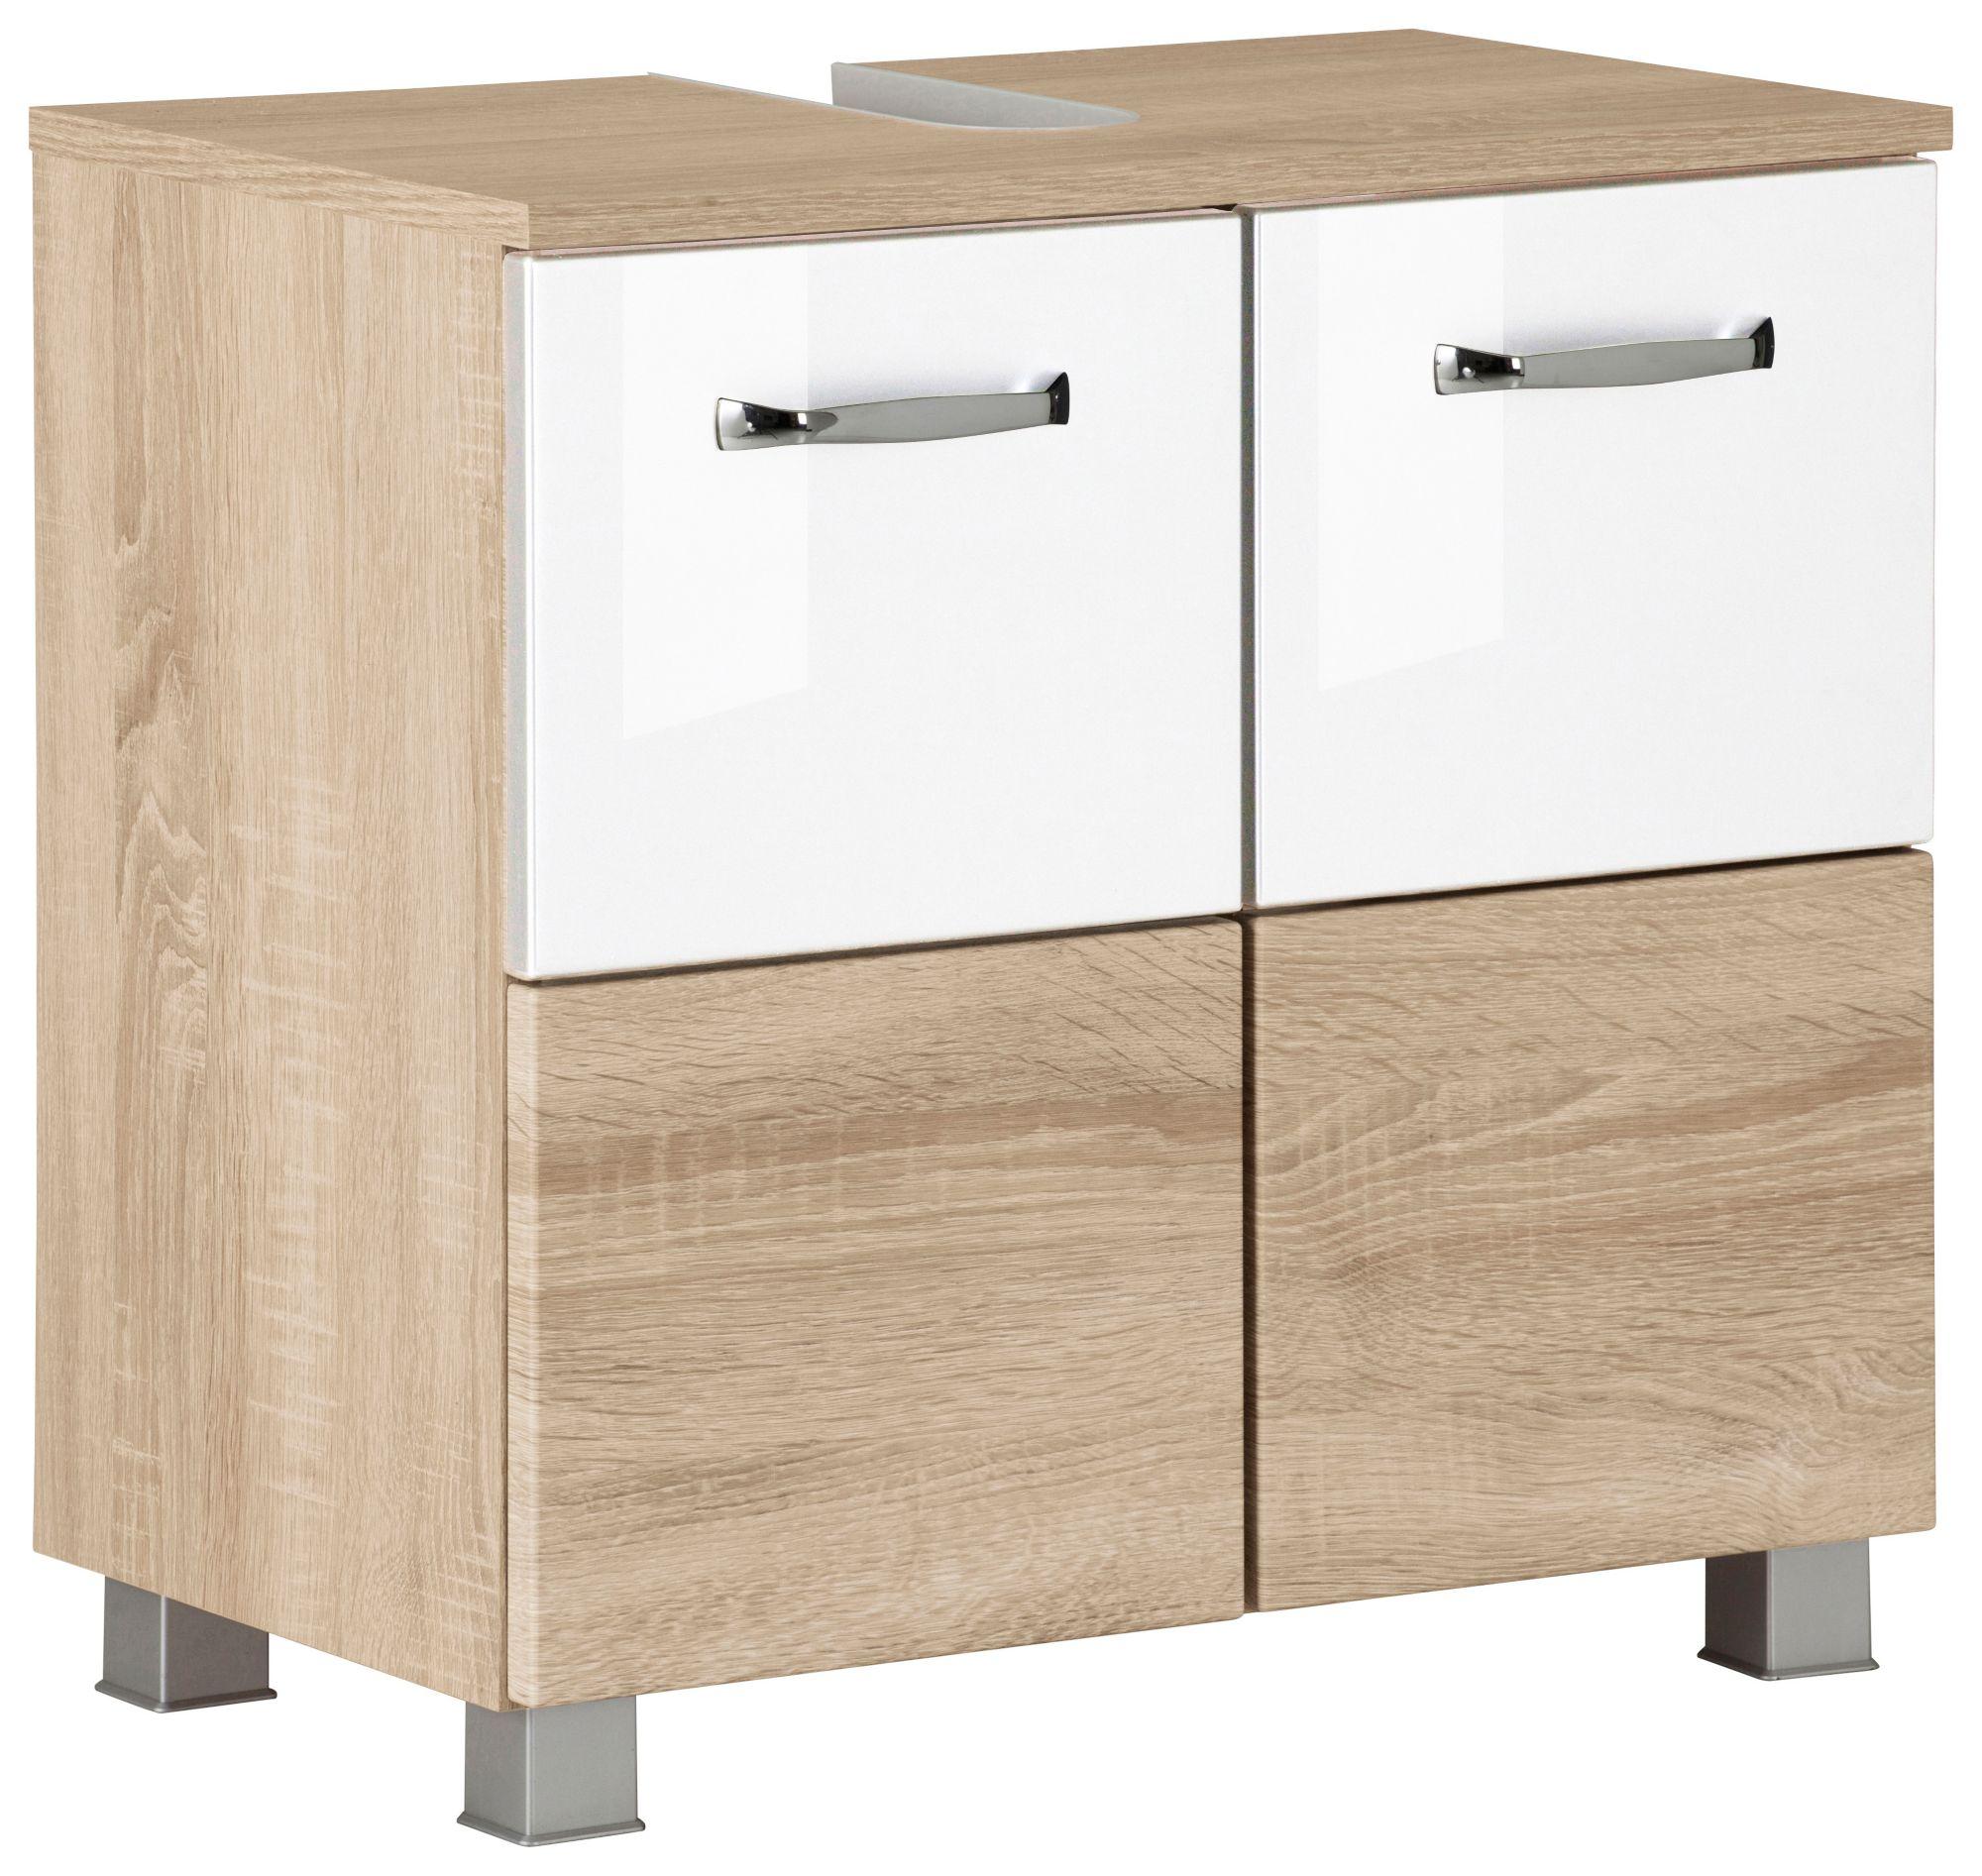 moebel g nstig online kaufen beim schwab versand. Black Bedroom Furniture Sets. Home Design Ideas